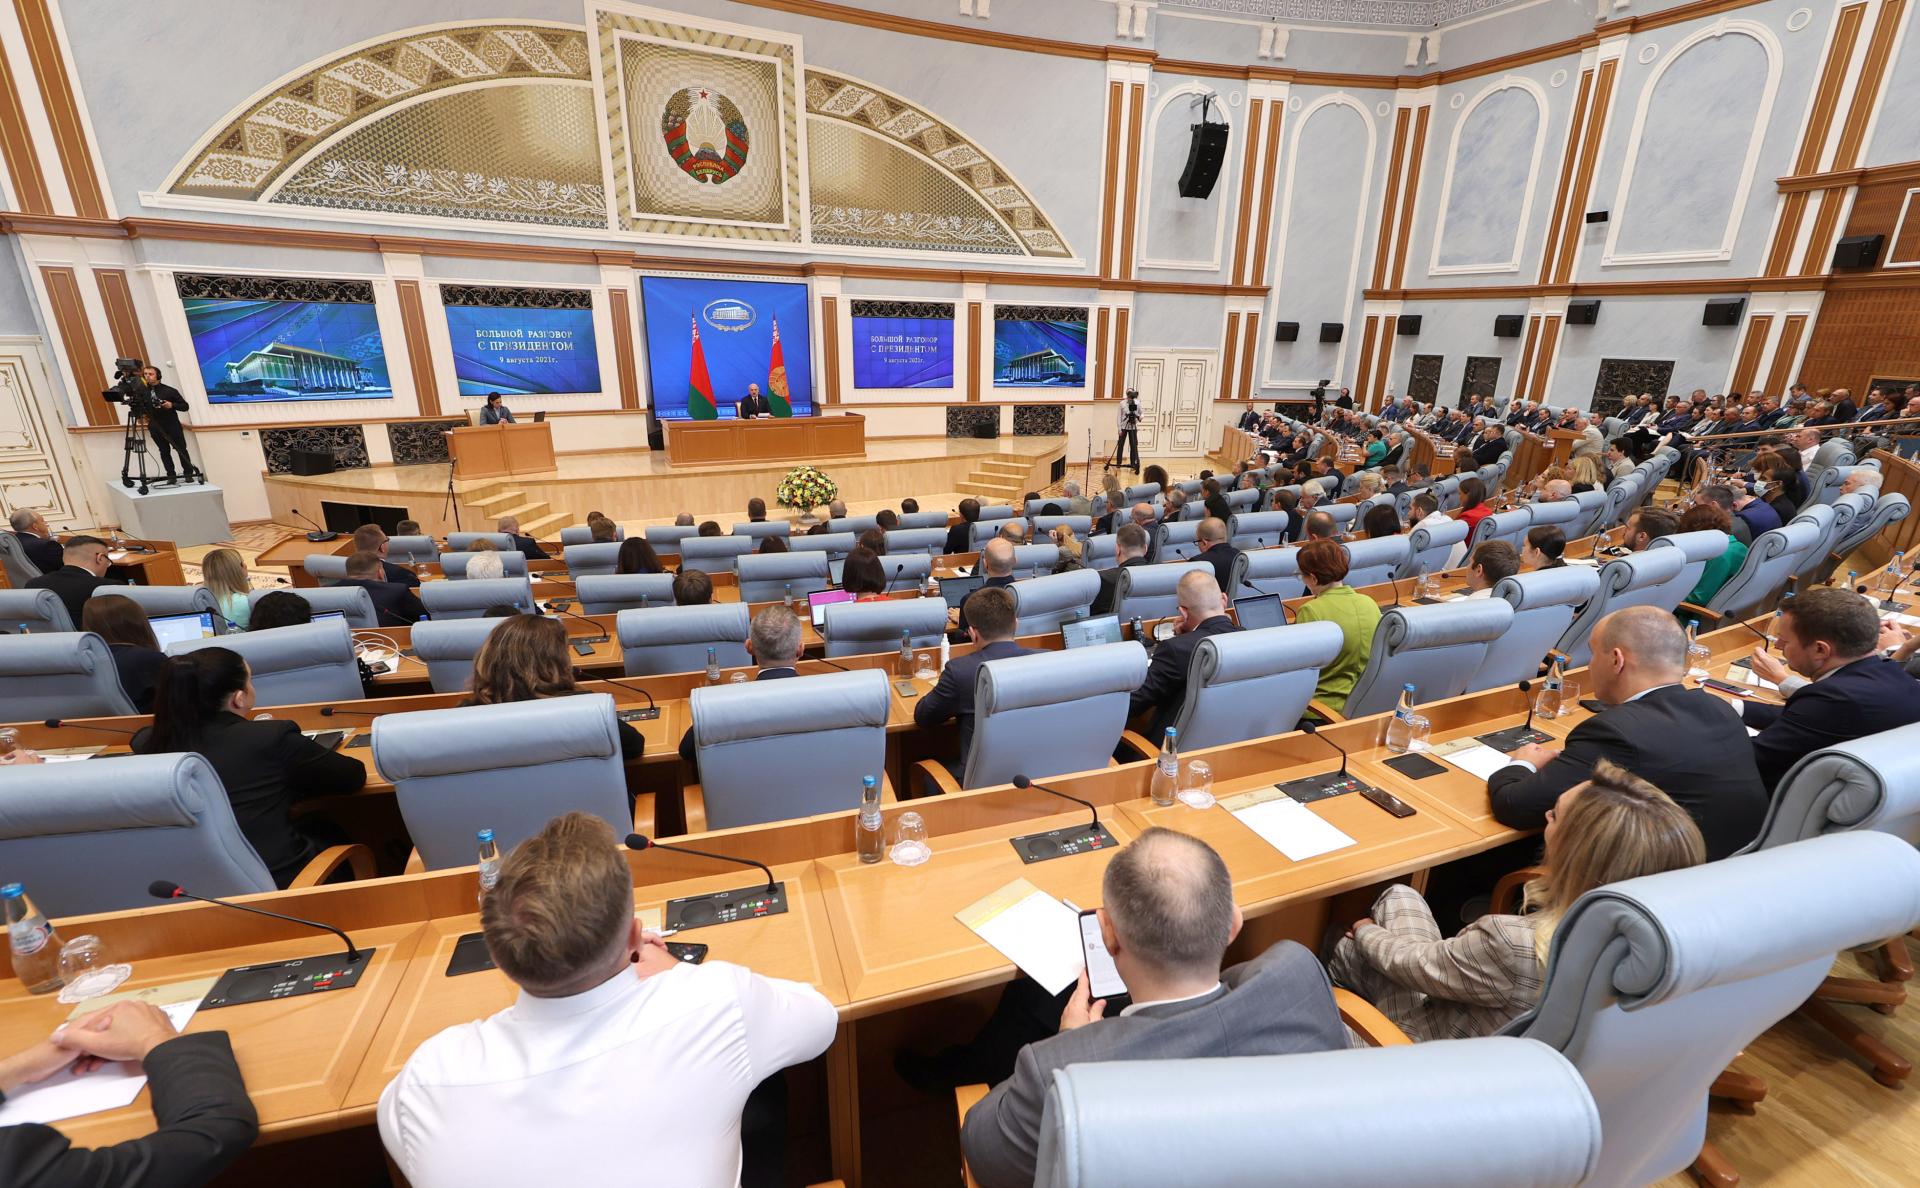 Пресс-конференция Александра Лукашенко